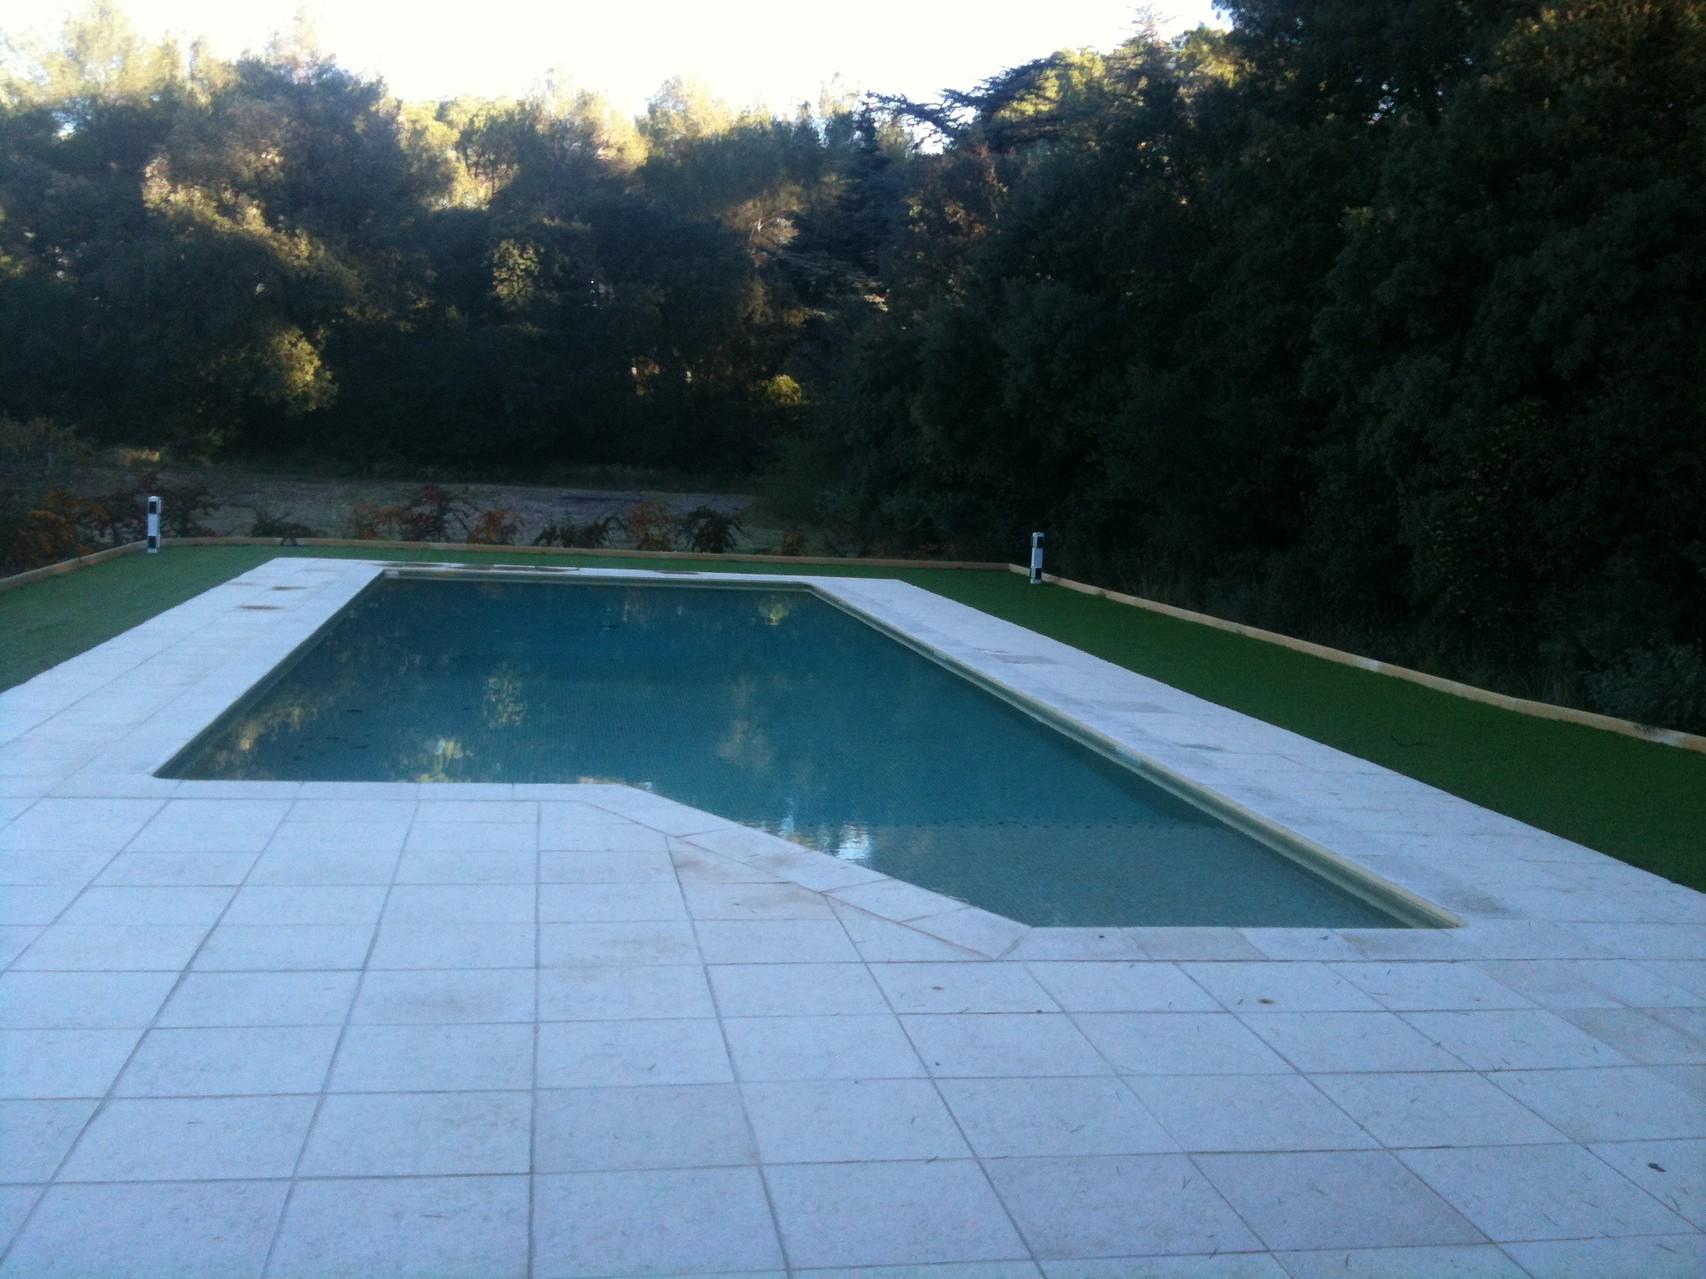 piscine a grand mottes